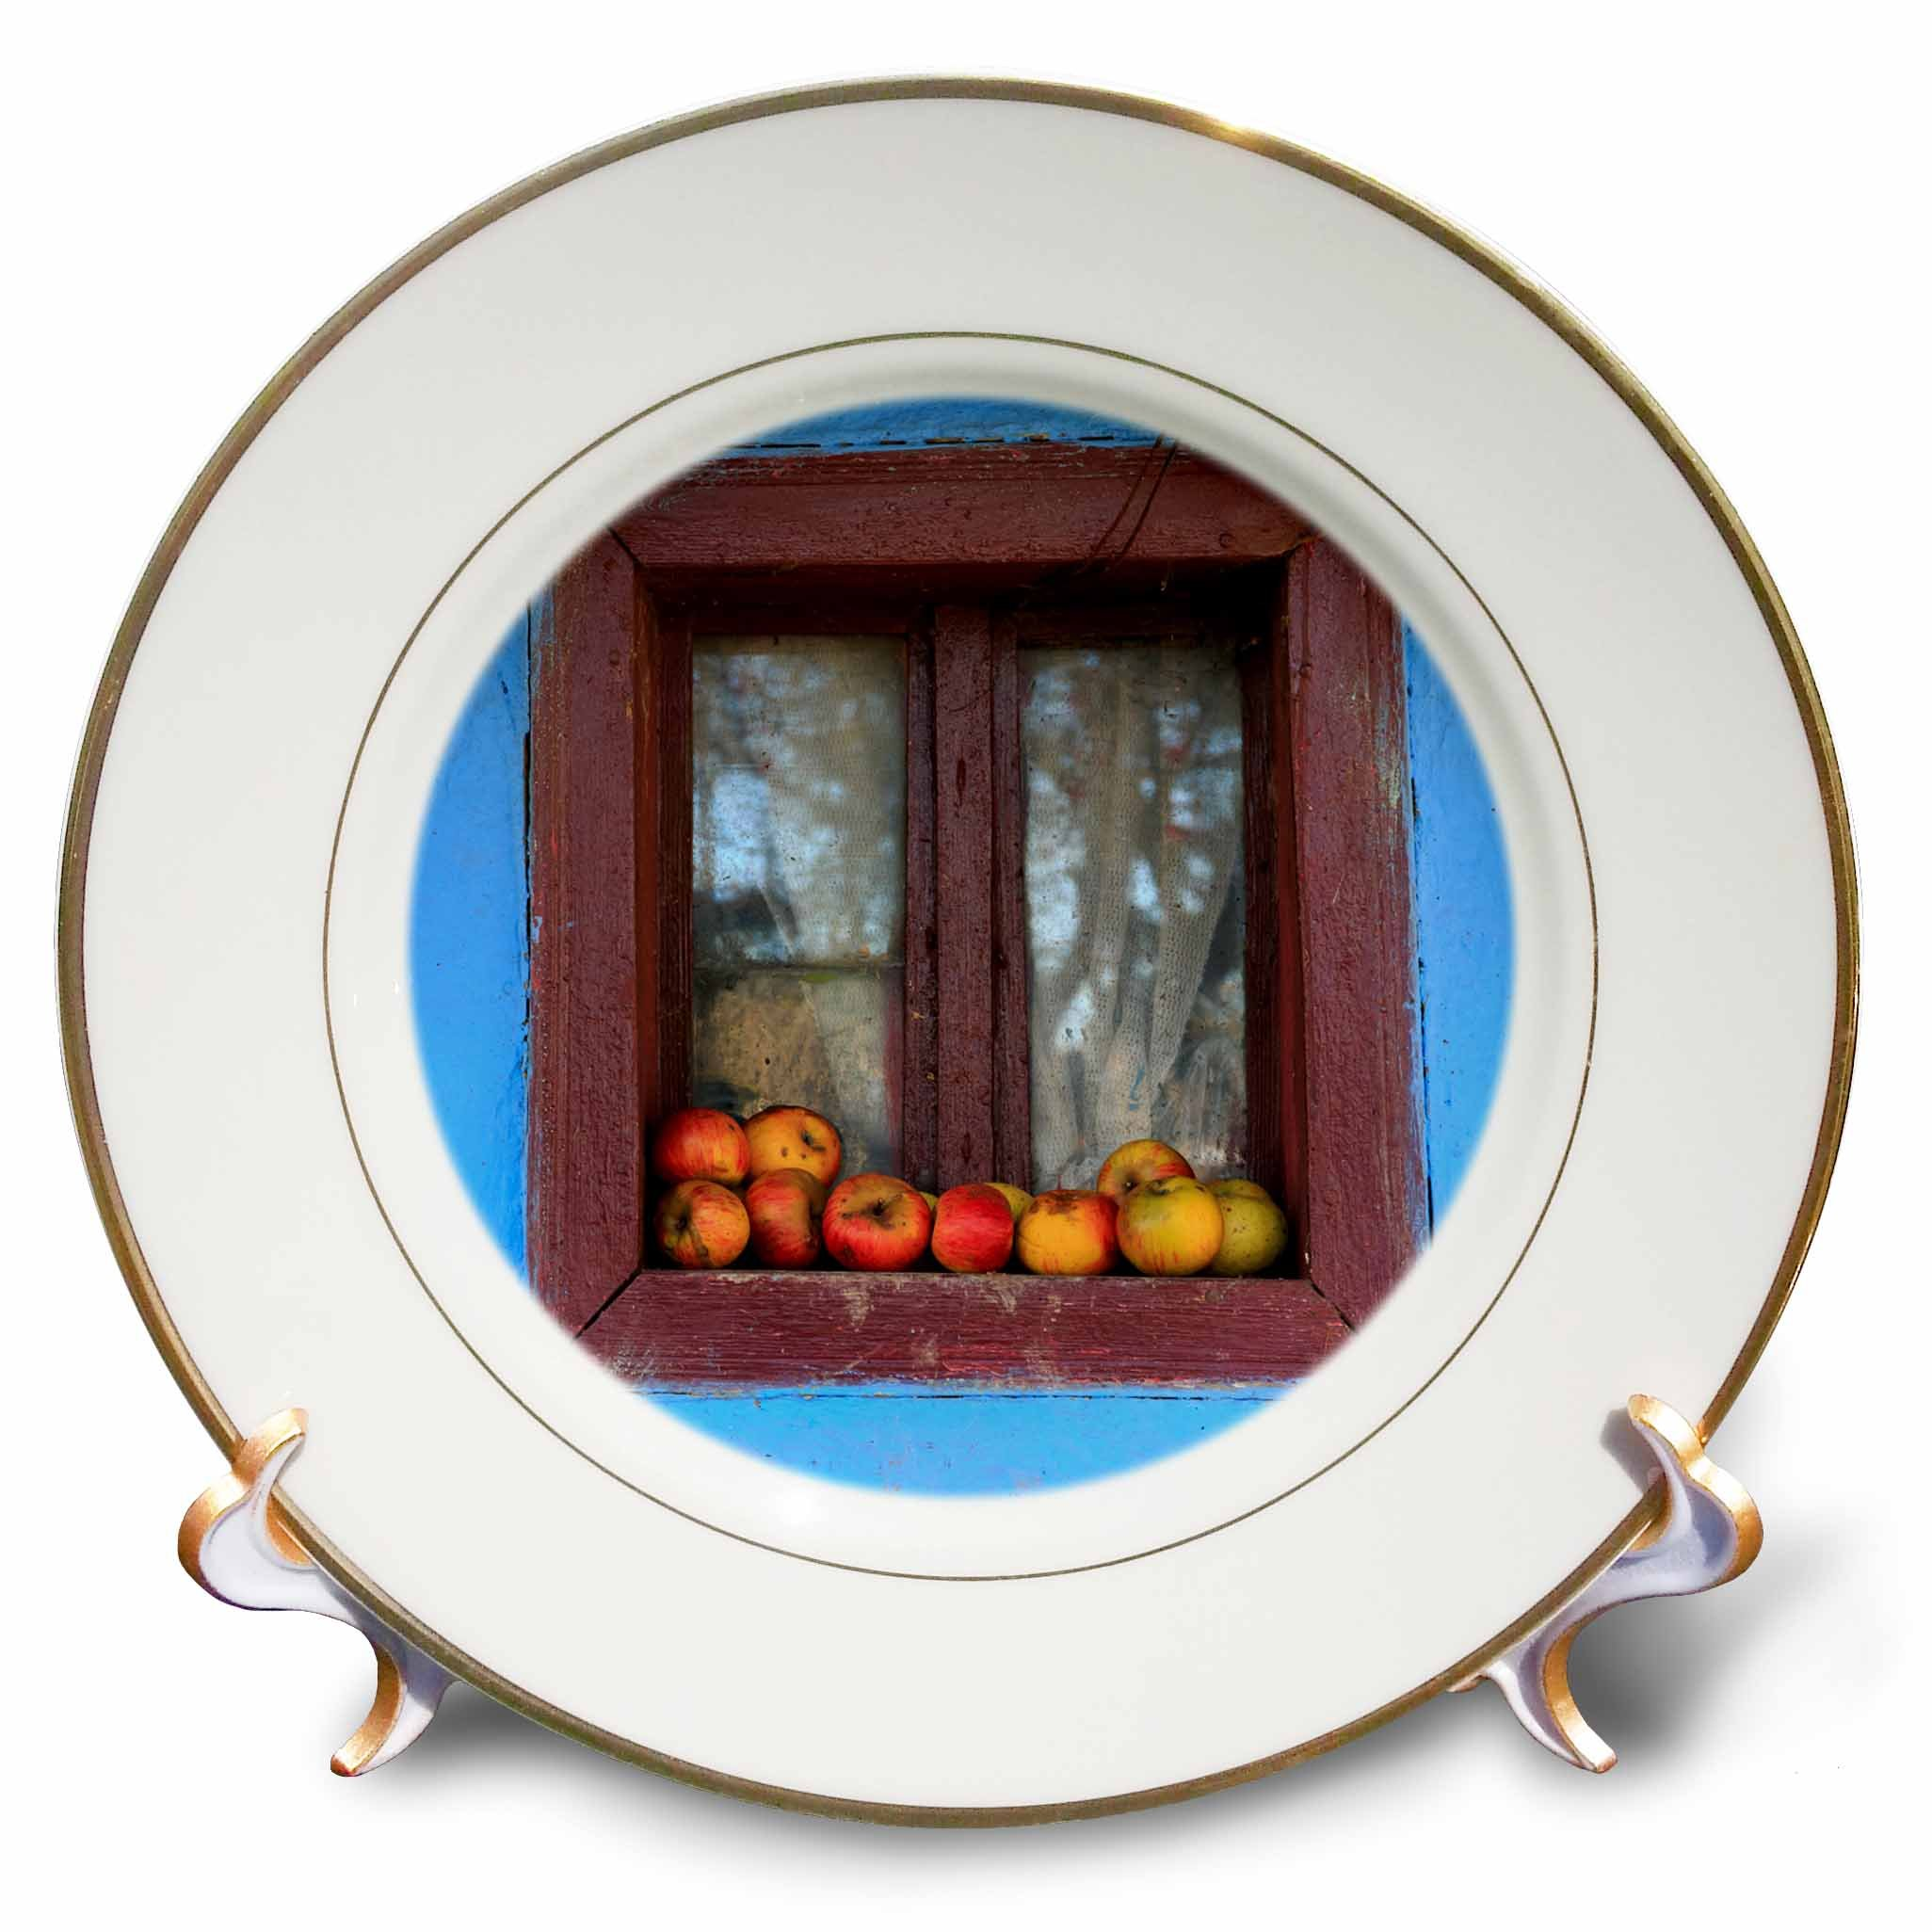 3dRose Danita Delimont - Food - Romania, Dobricu Lapusului. Typical farm house, Window with apples. - 8 inch Porcelain Plate (cp_277876_1) by 3dRose (Image #1)